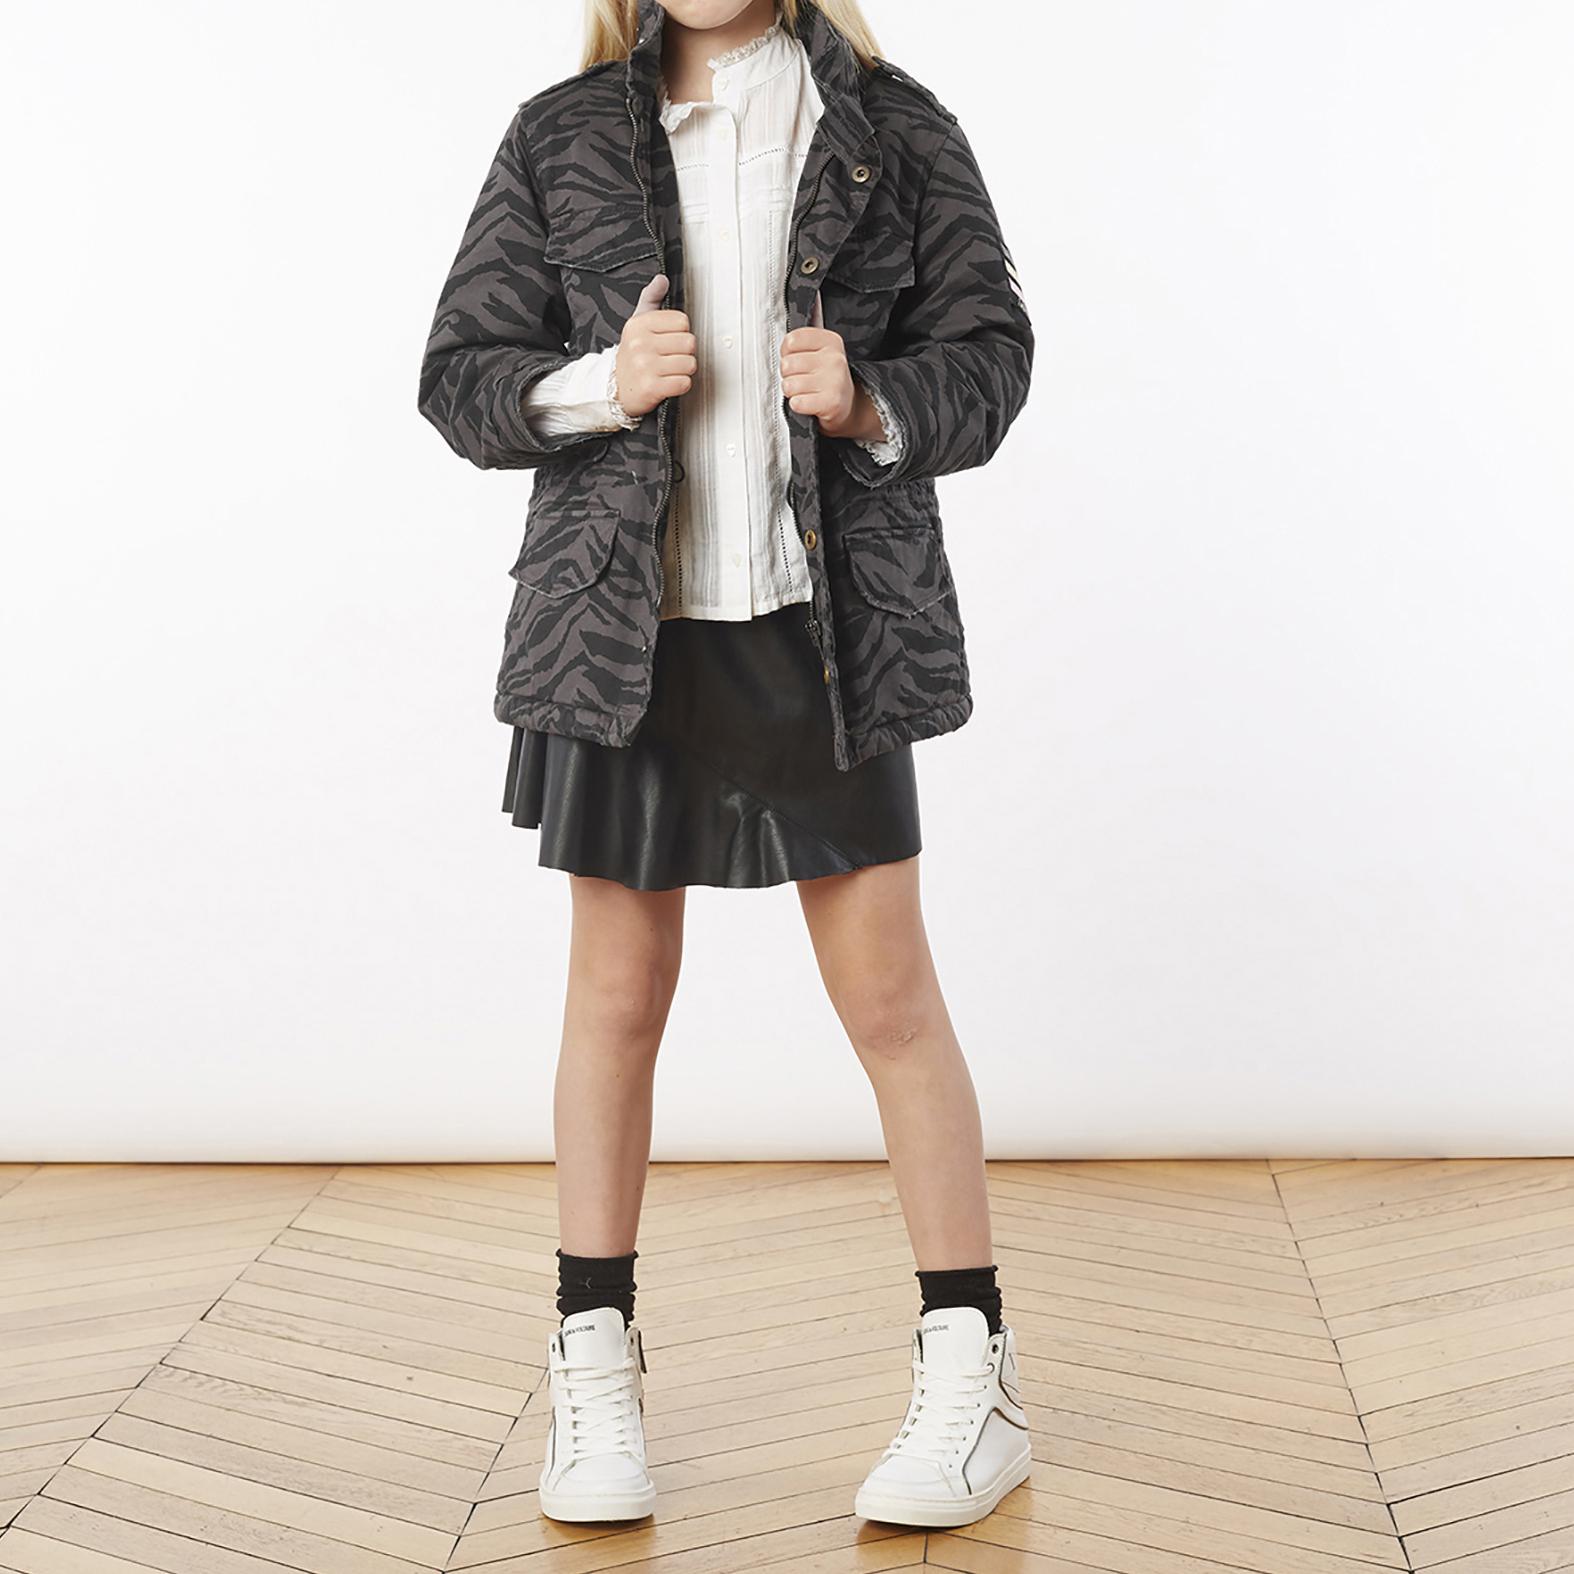 Short imitation leather skirt ZADIG & VOLTAIRE for GIRL